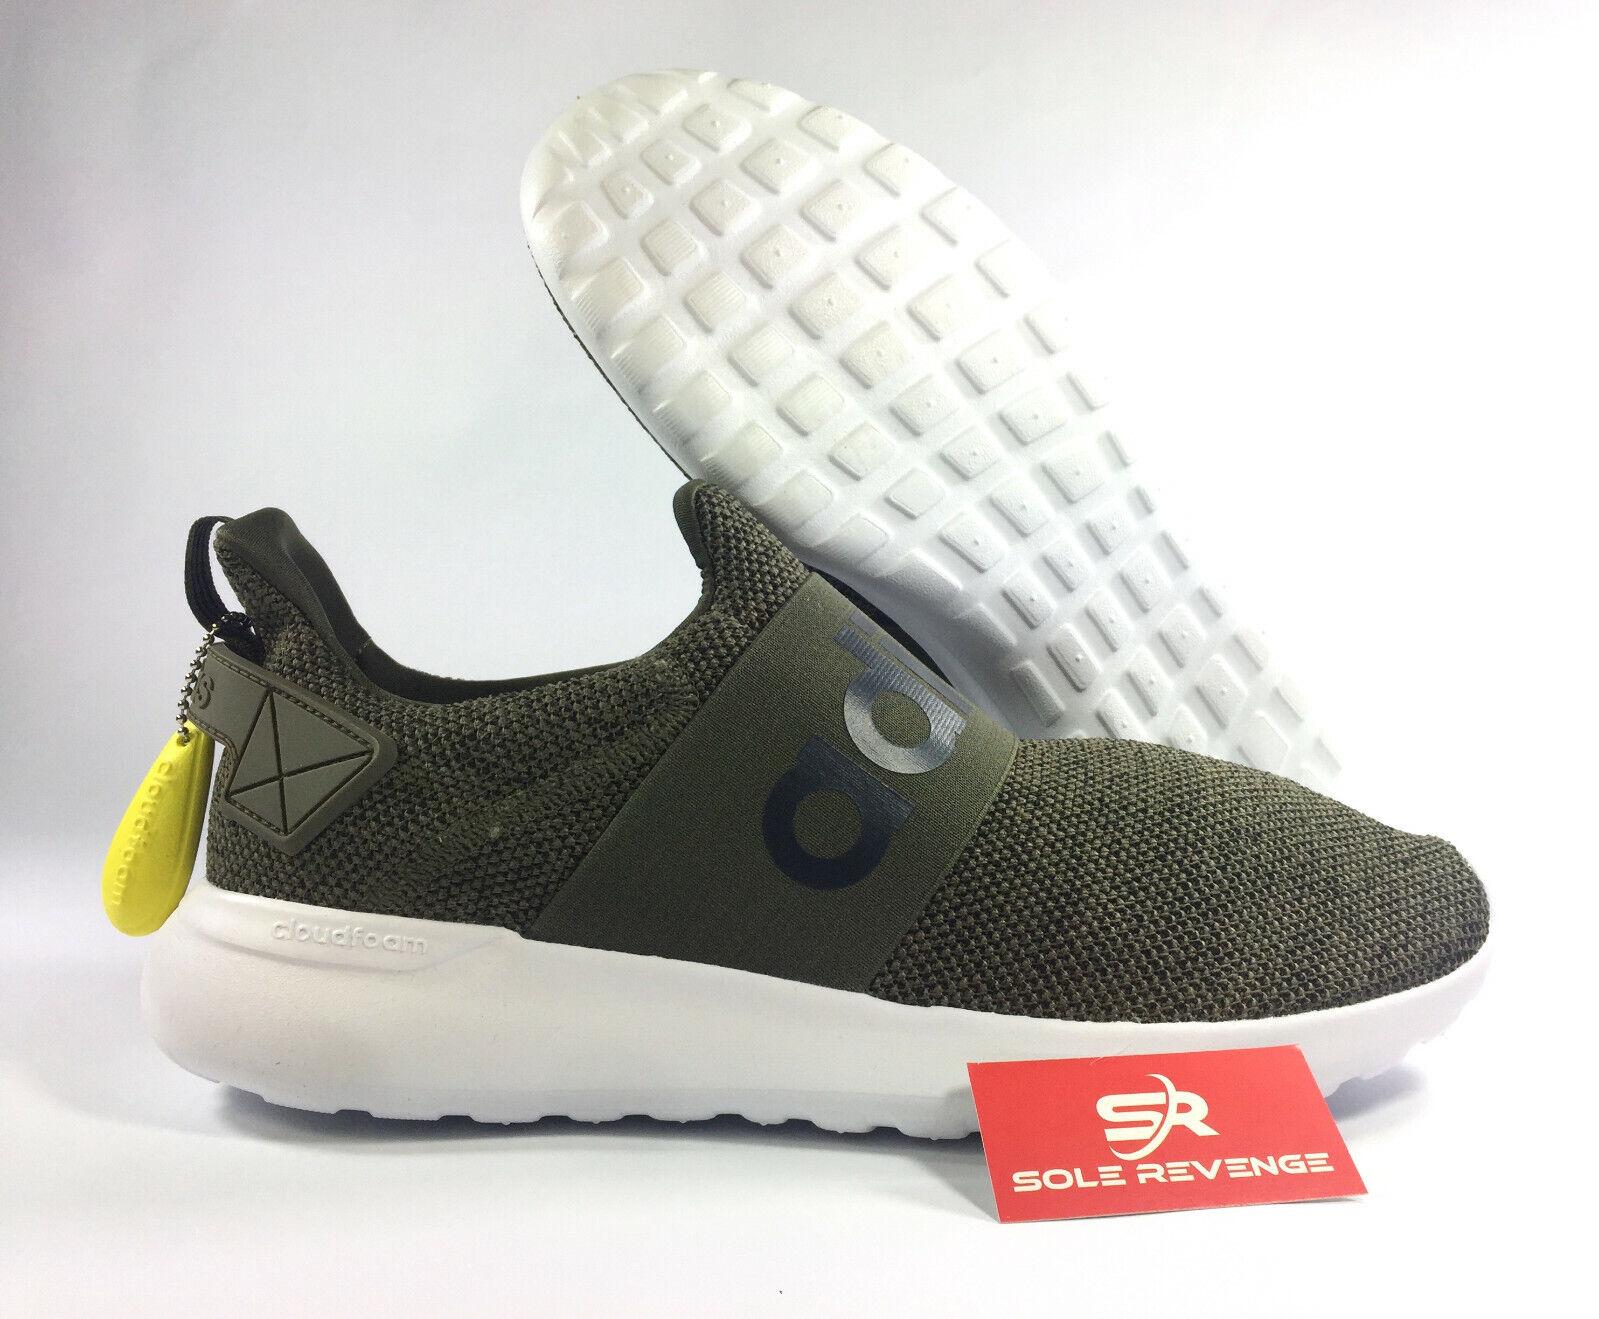 9ae1f6528094f New adidas LITE RACER CF SLIP-ON ADAPT - Cloudfoam Green White shoes  BB1644. Merrell Men s ...